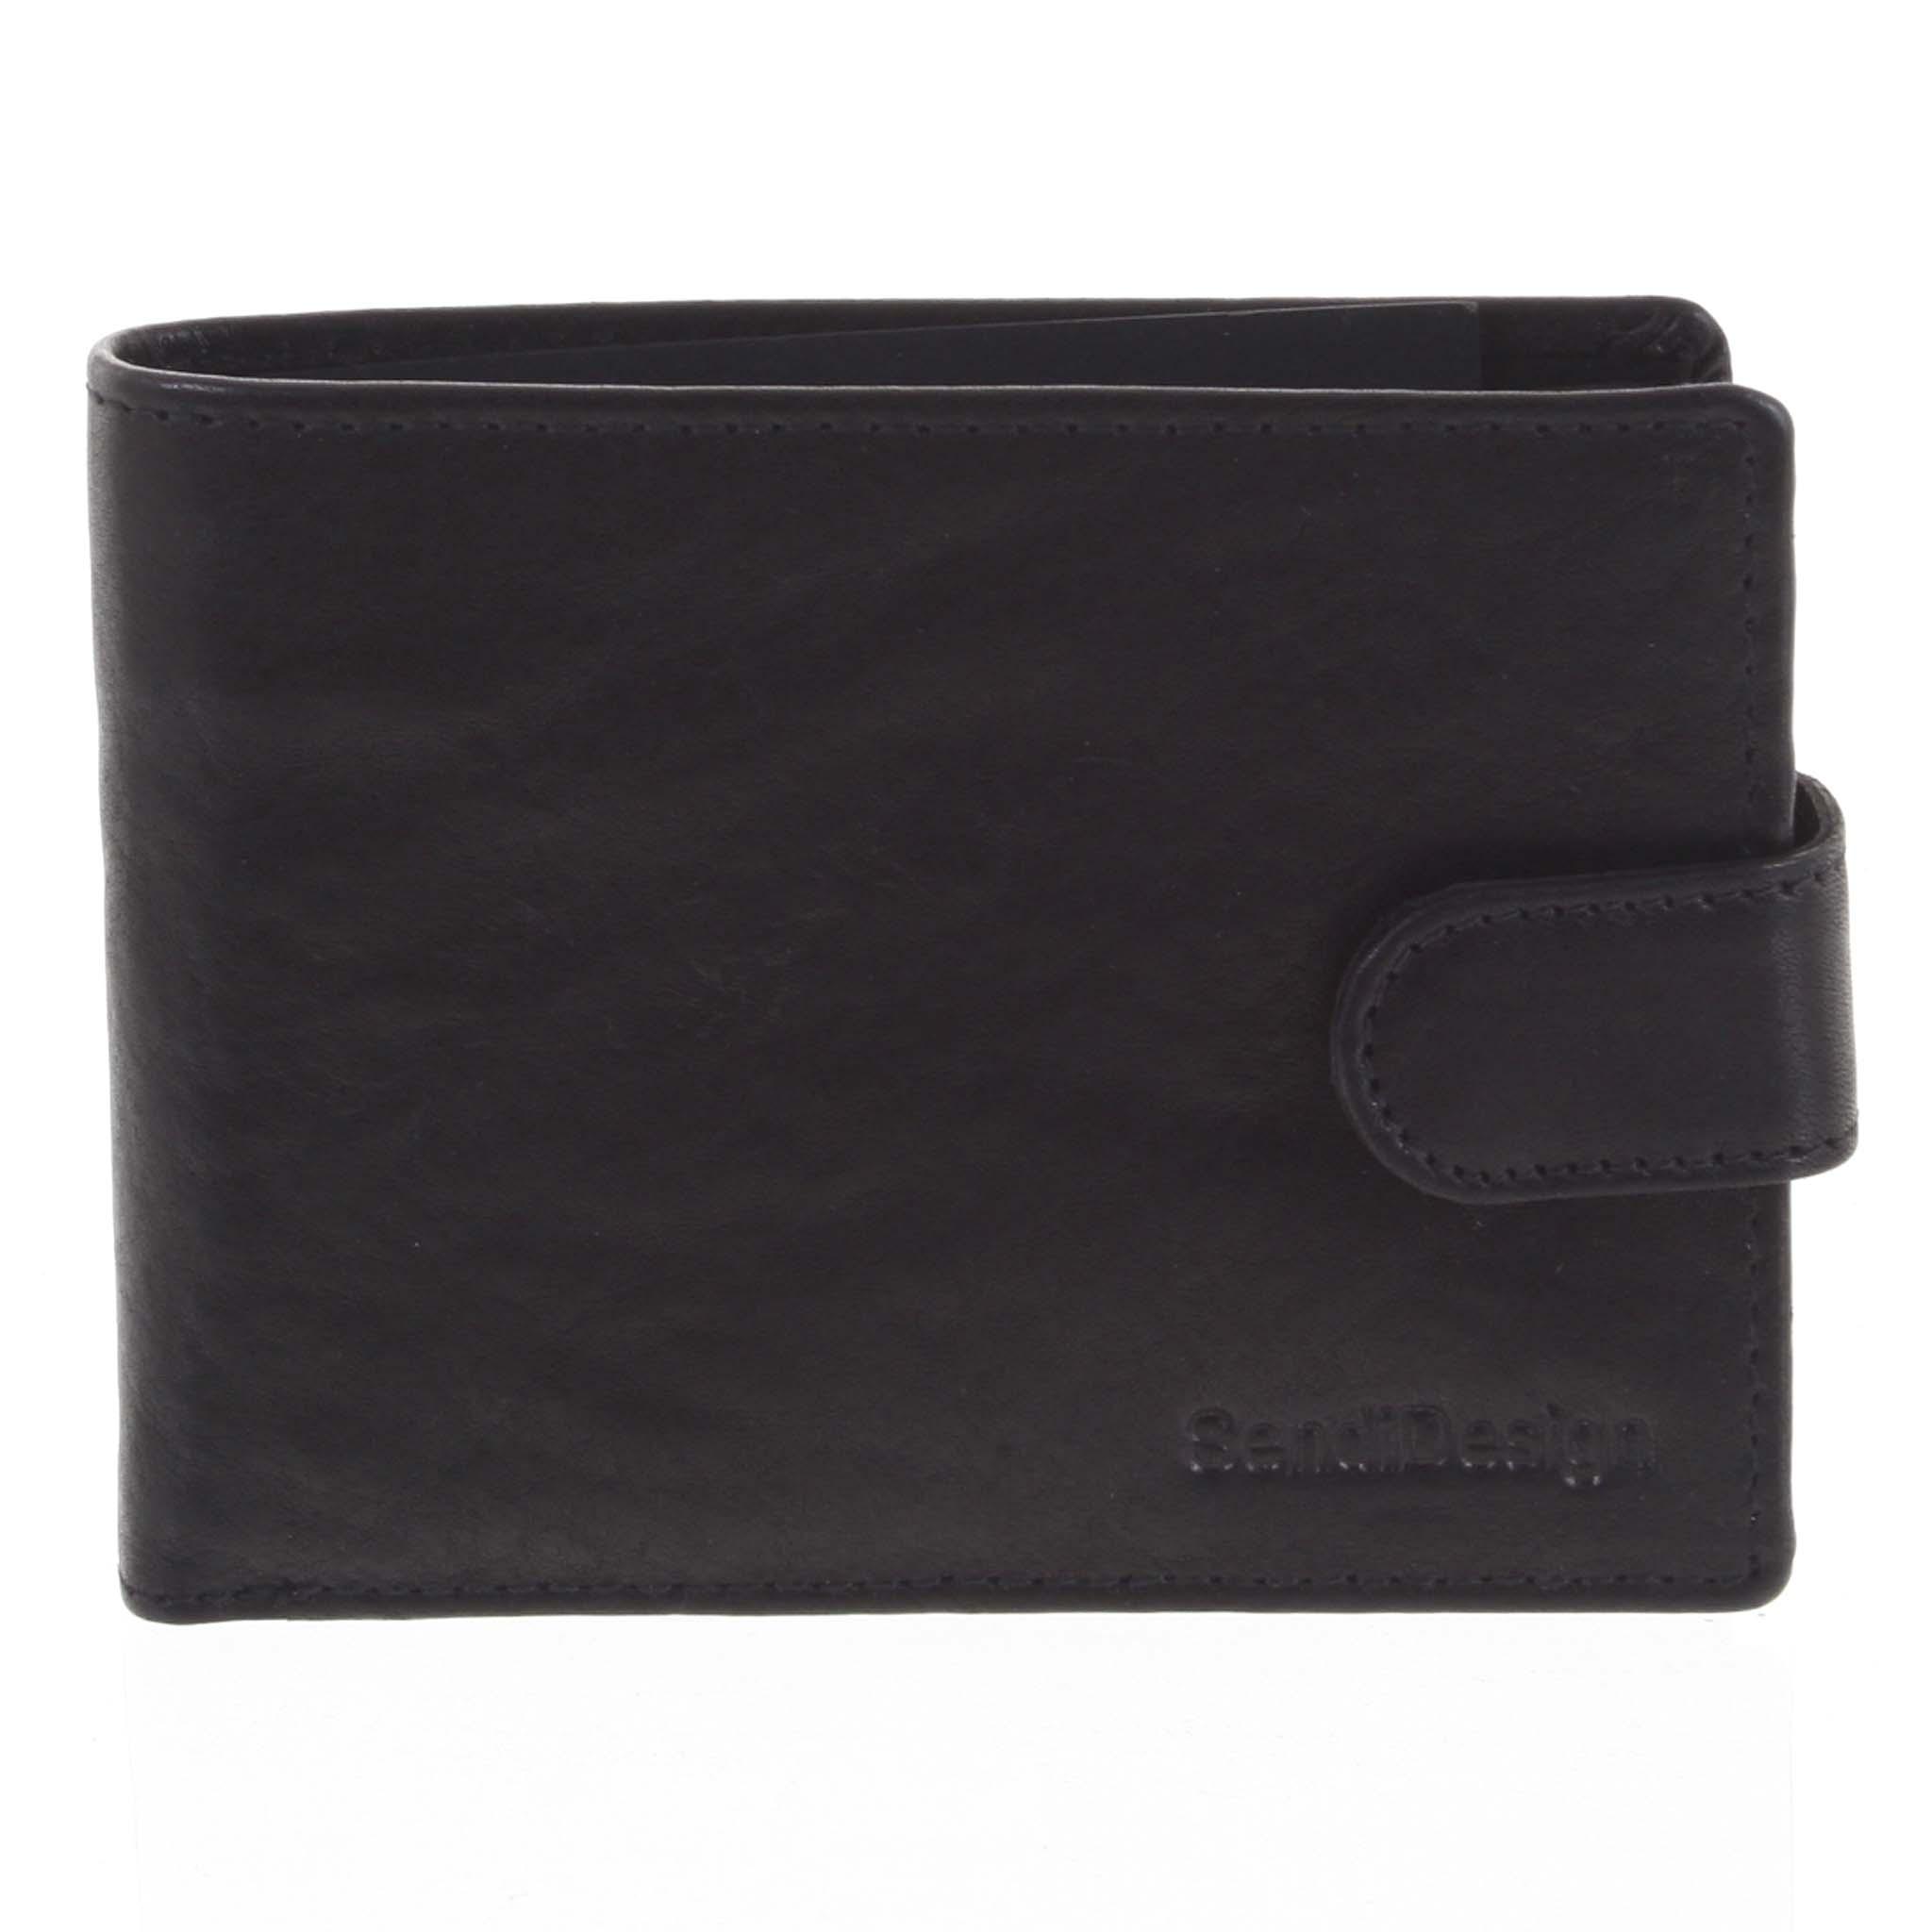 Pánská kožená peněženka černá - SendiDesign Mheo